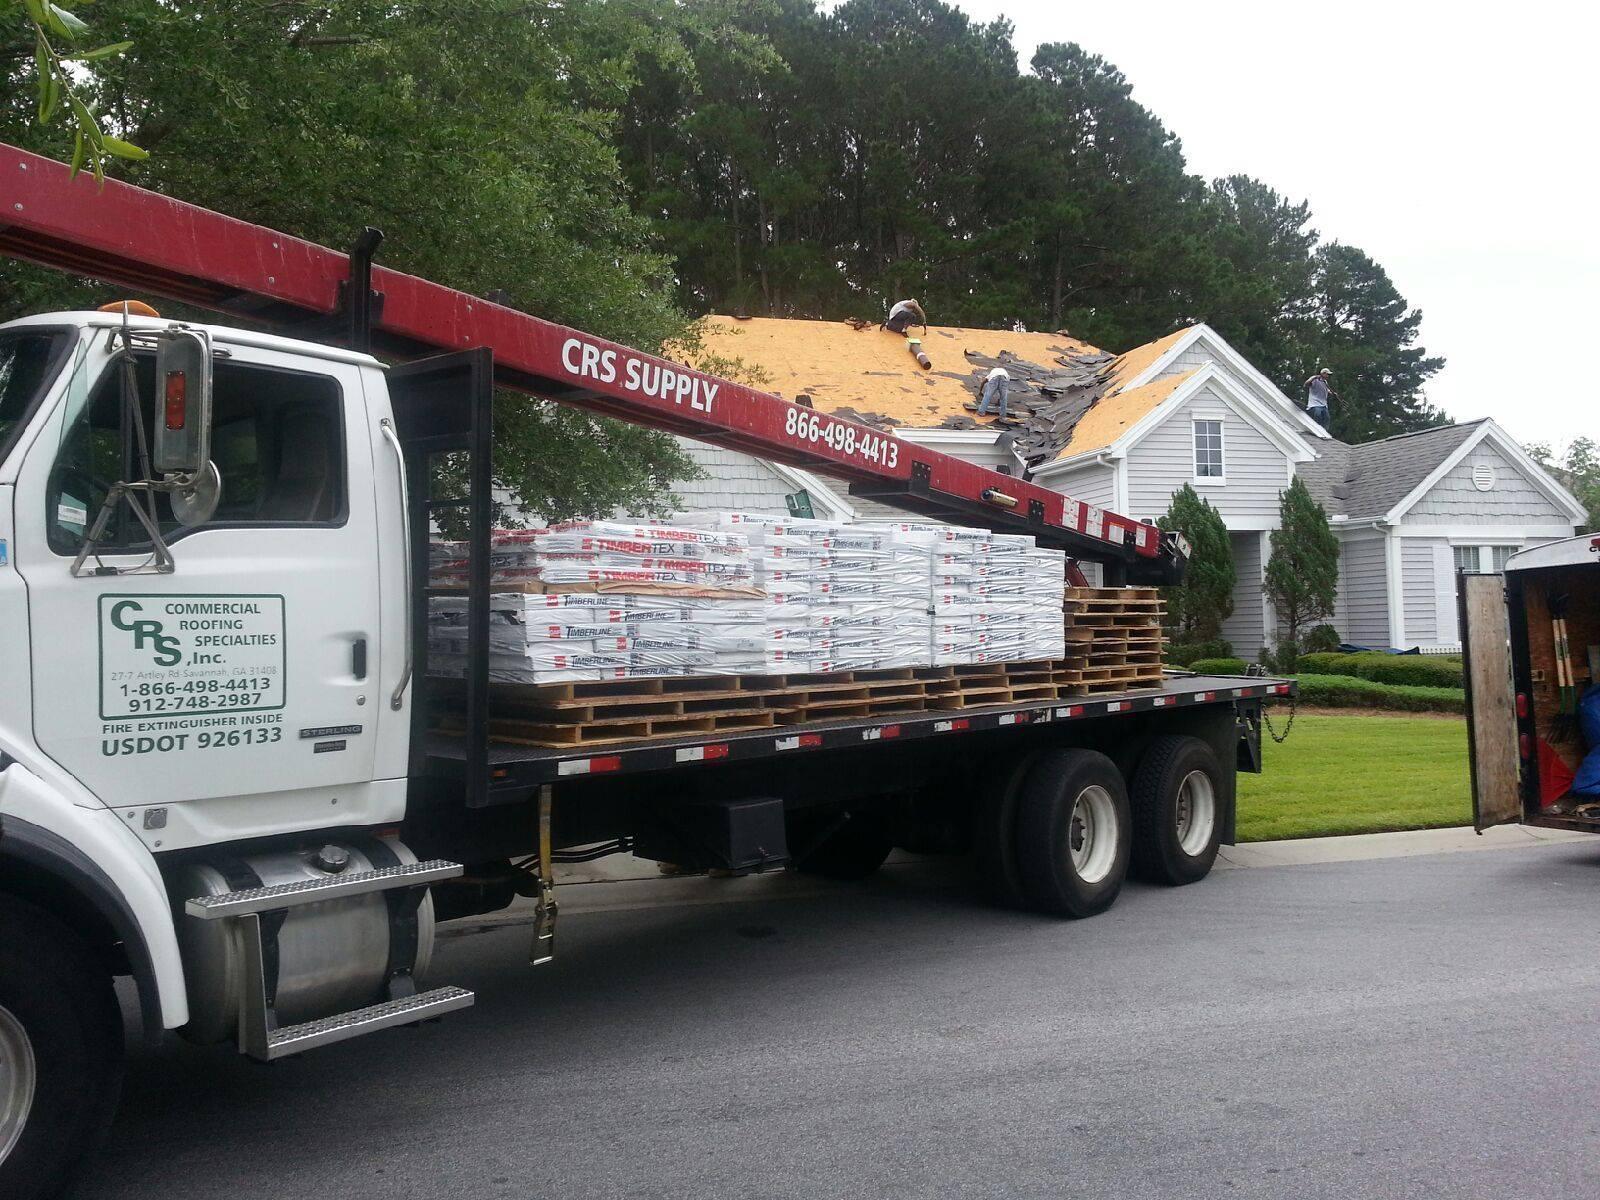 RoofCrafters-Savannah image 28